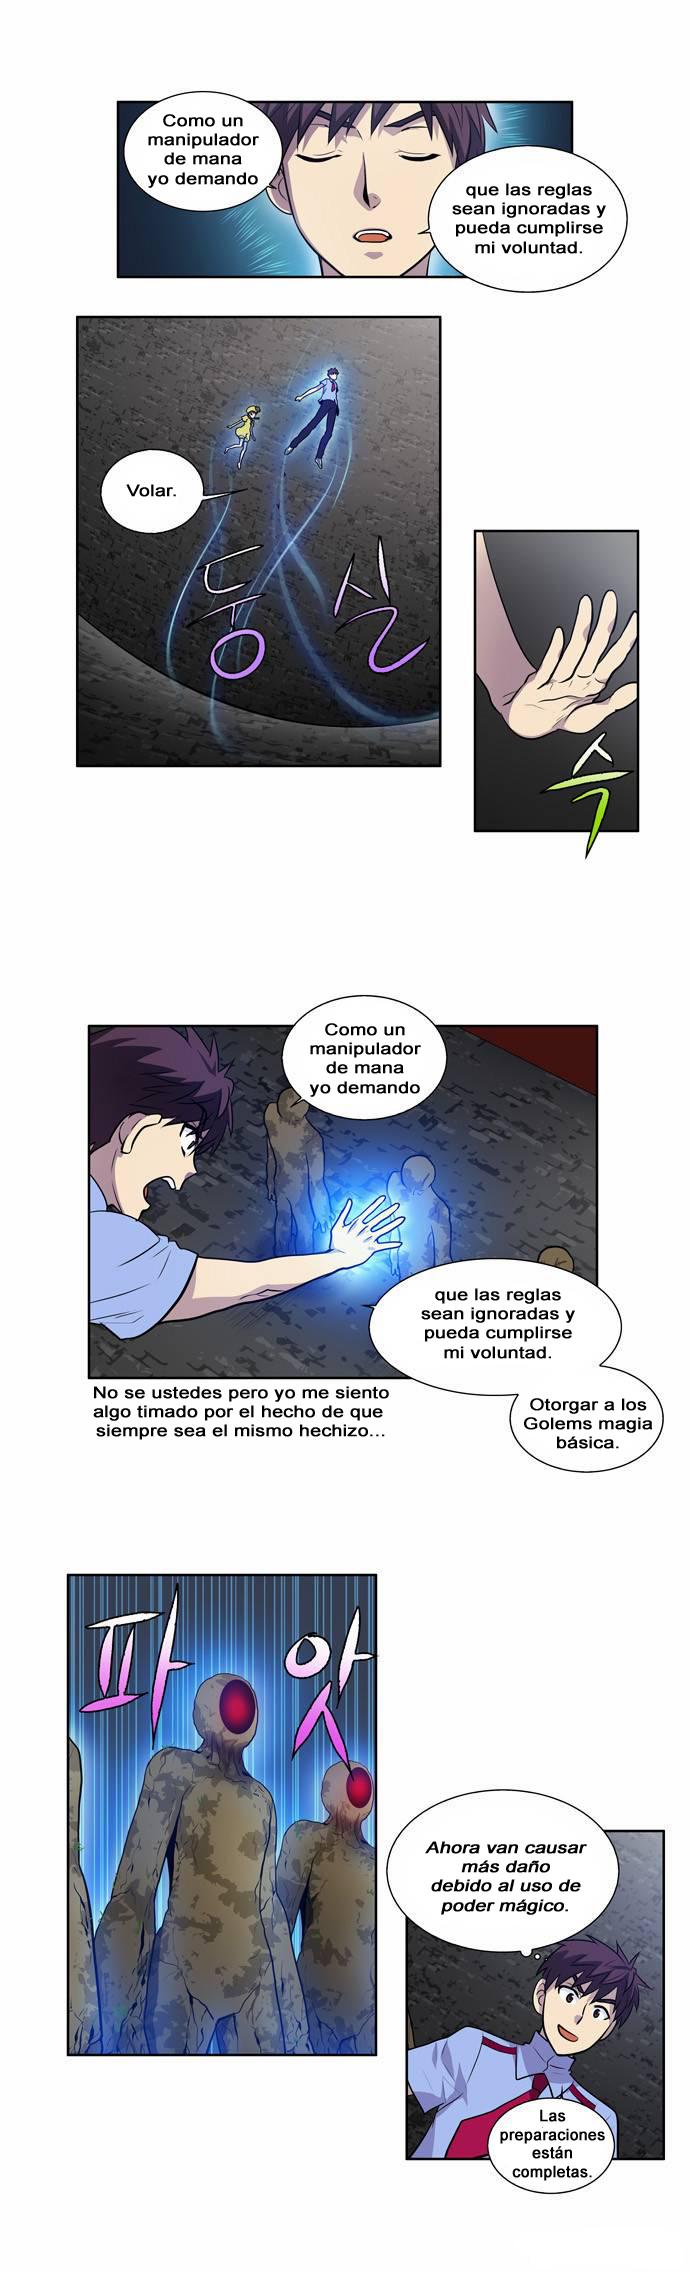 http://c5.ninemanga.com/es_manga/61/1725/396911/3ee61fdf9d79ea6a5020b6a47be0ea5b.jpg Page 3